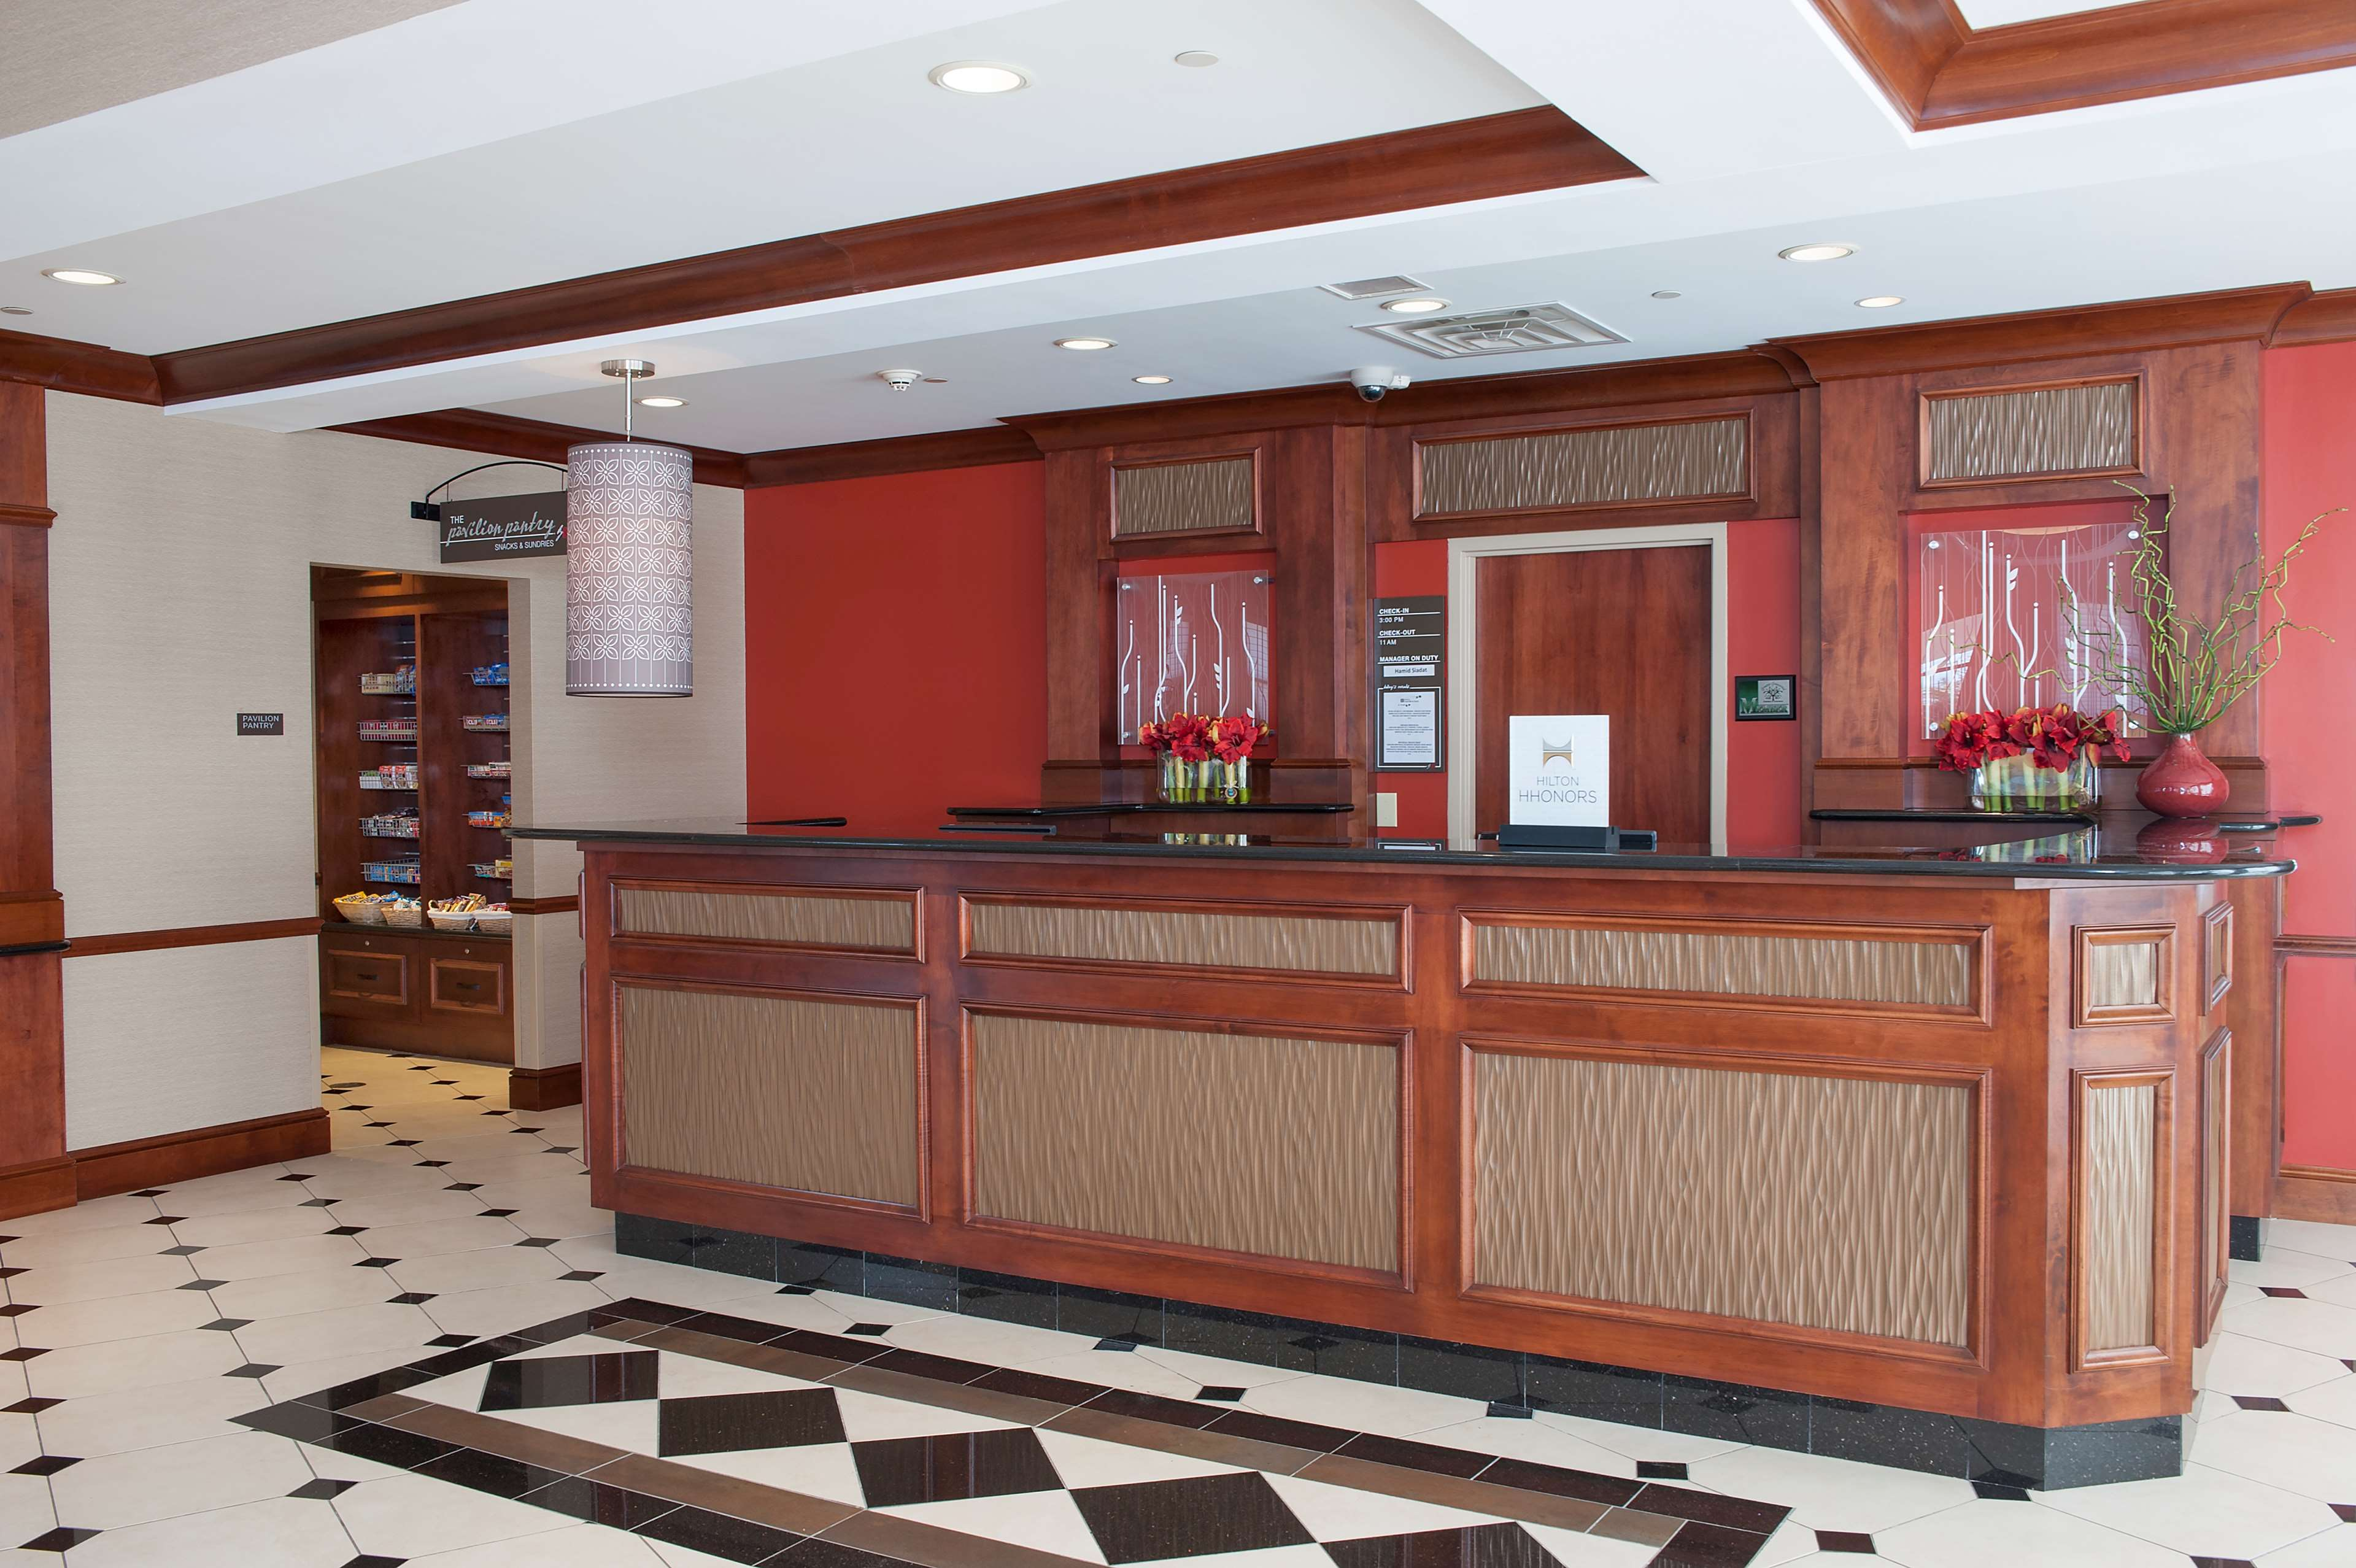 Hilton Garden Inn Indianapolis South/Greenwood image 2